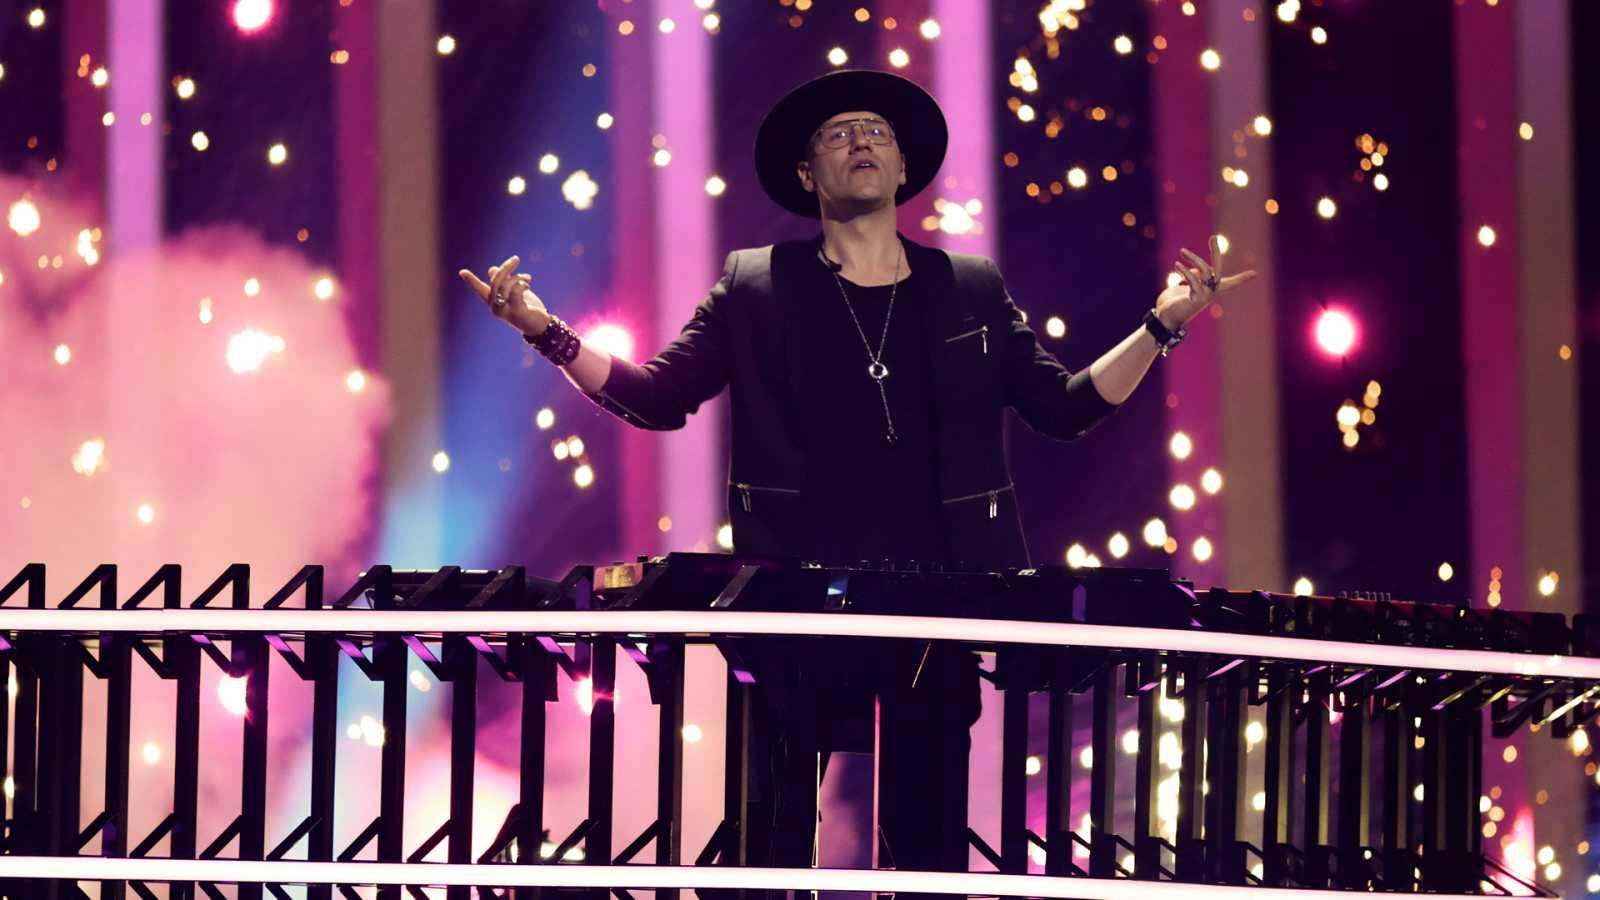 "Eurovisión - Polonia: Gromee y Lukas Meijer canta ""Light me up"" en la segunda semifinal de Eurovisión 2018"